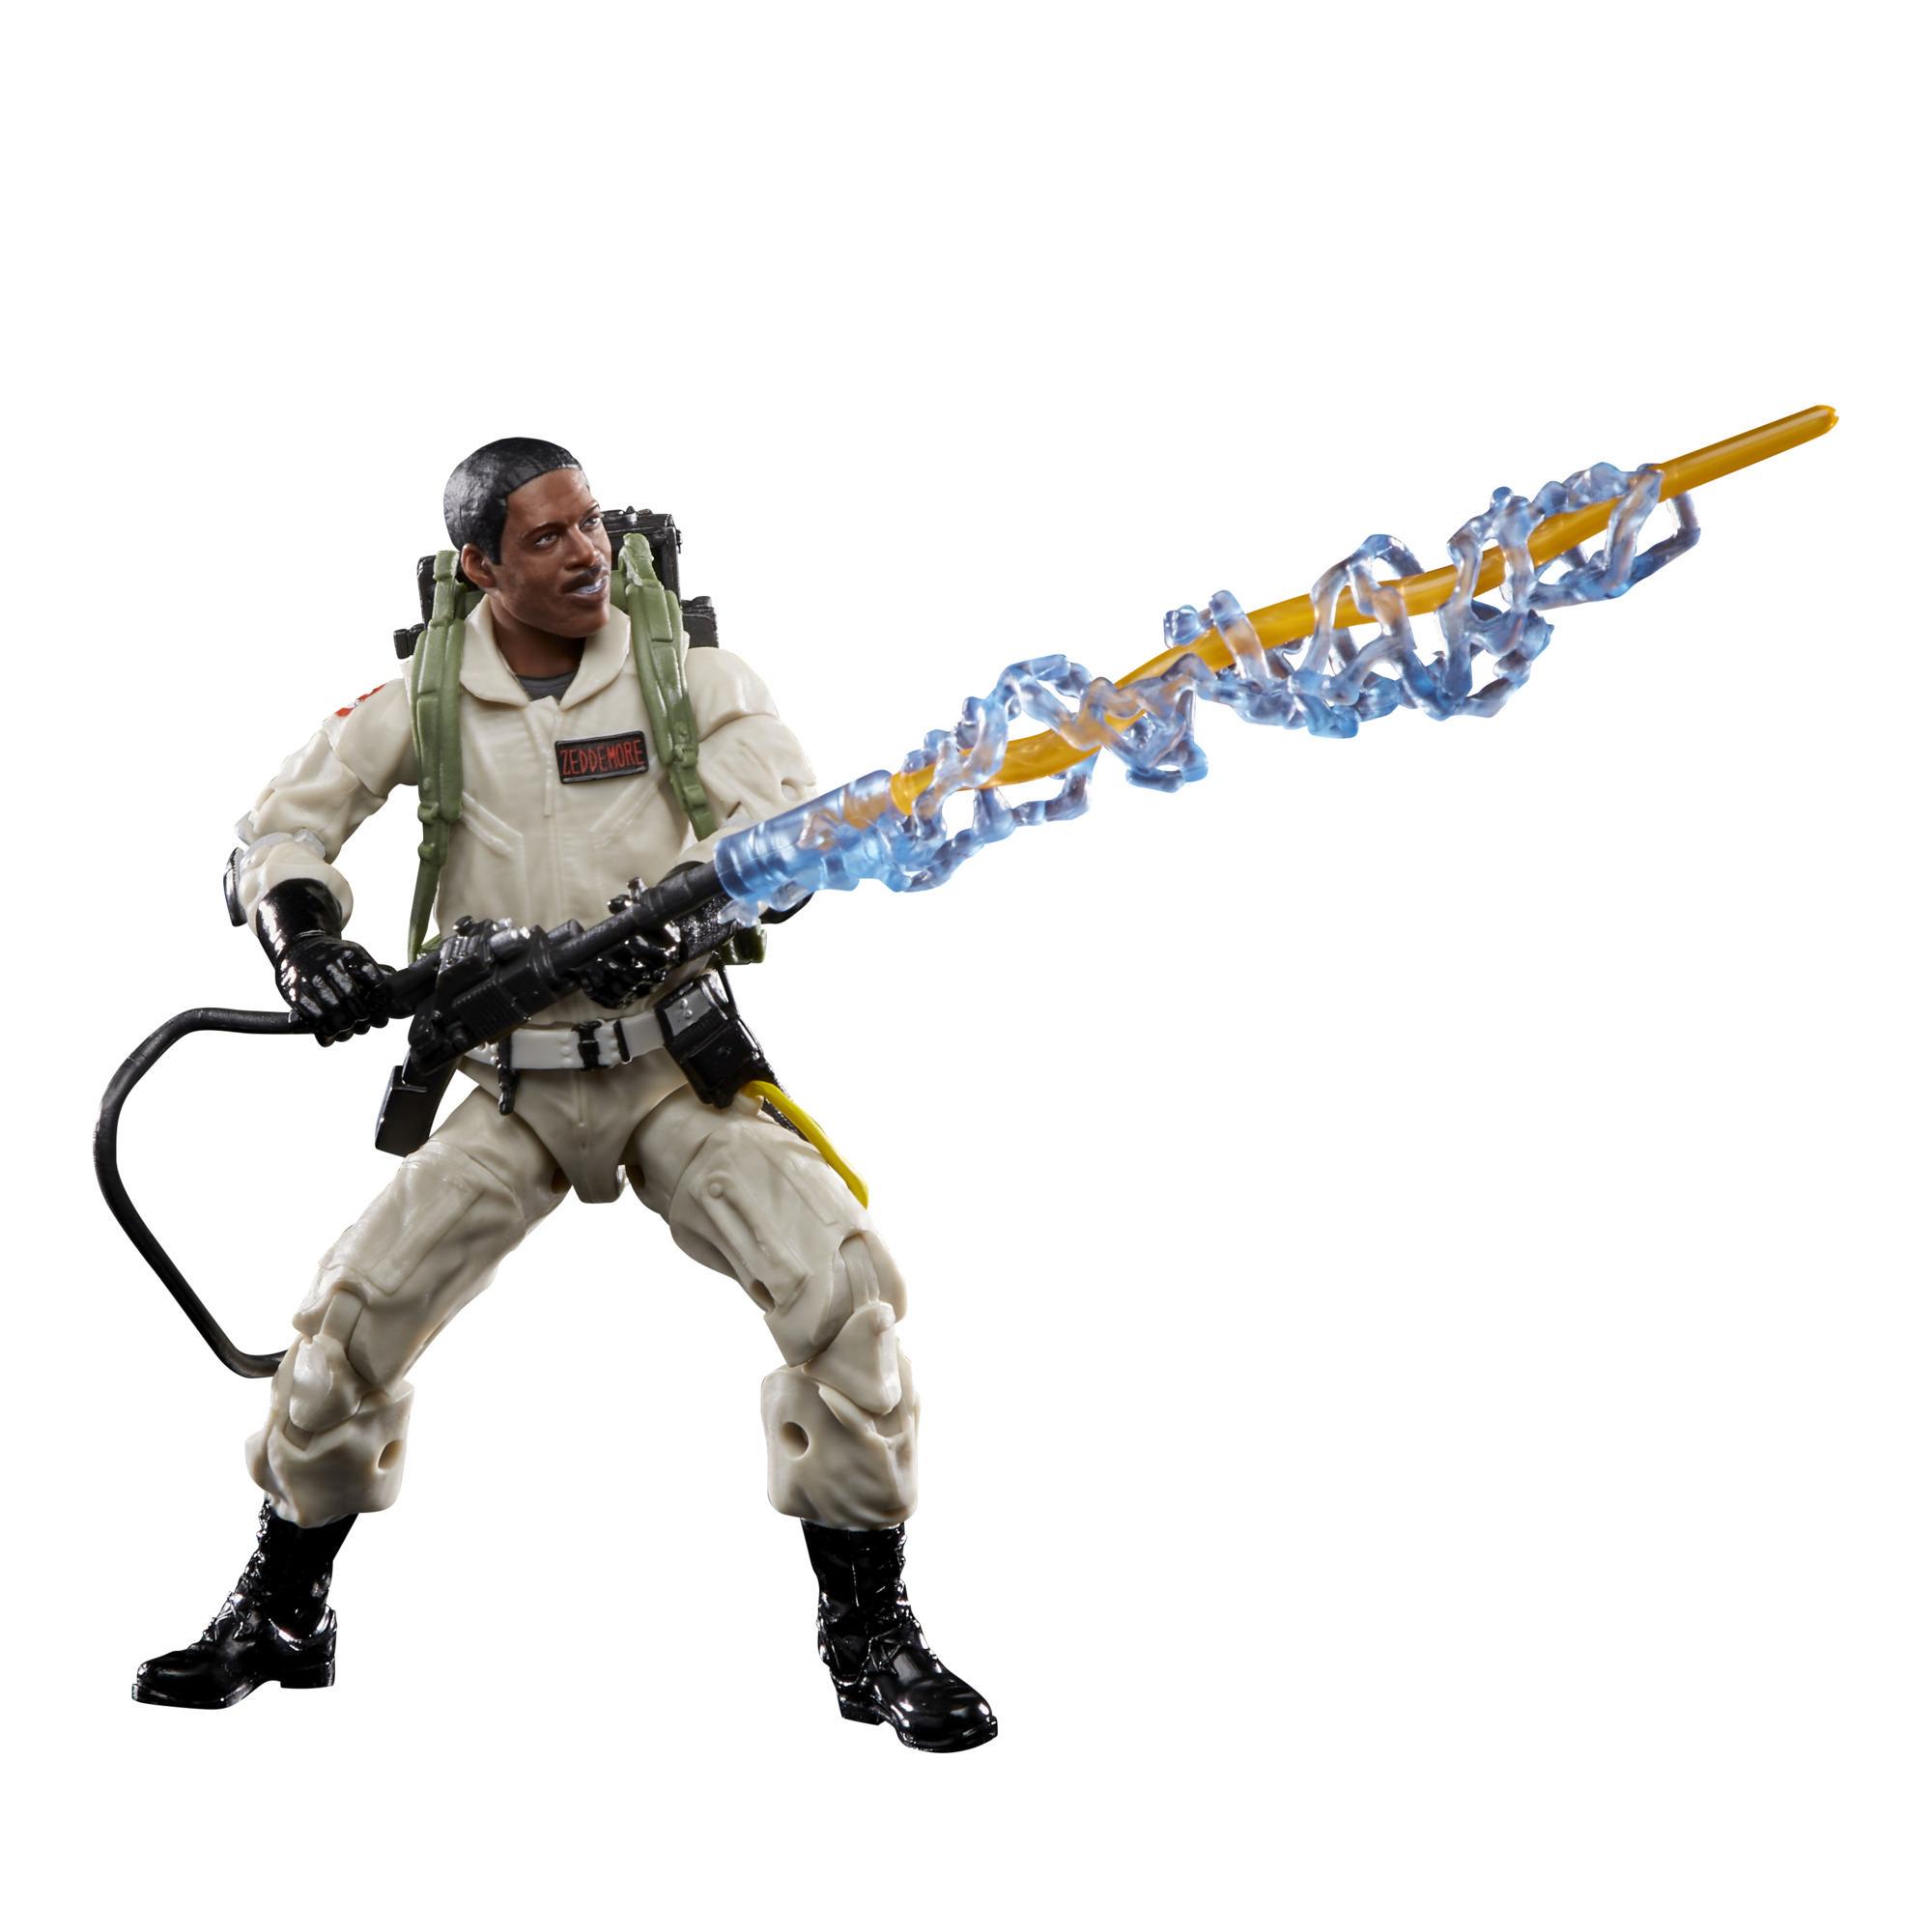 Ghostbusters Plasma Series Winston Zeddemore Action-Figur